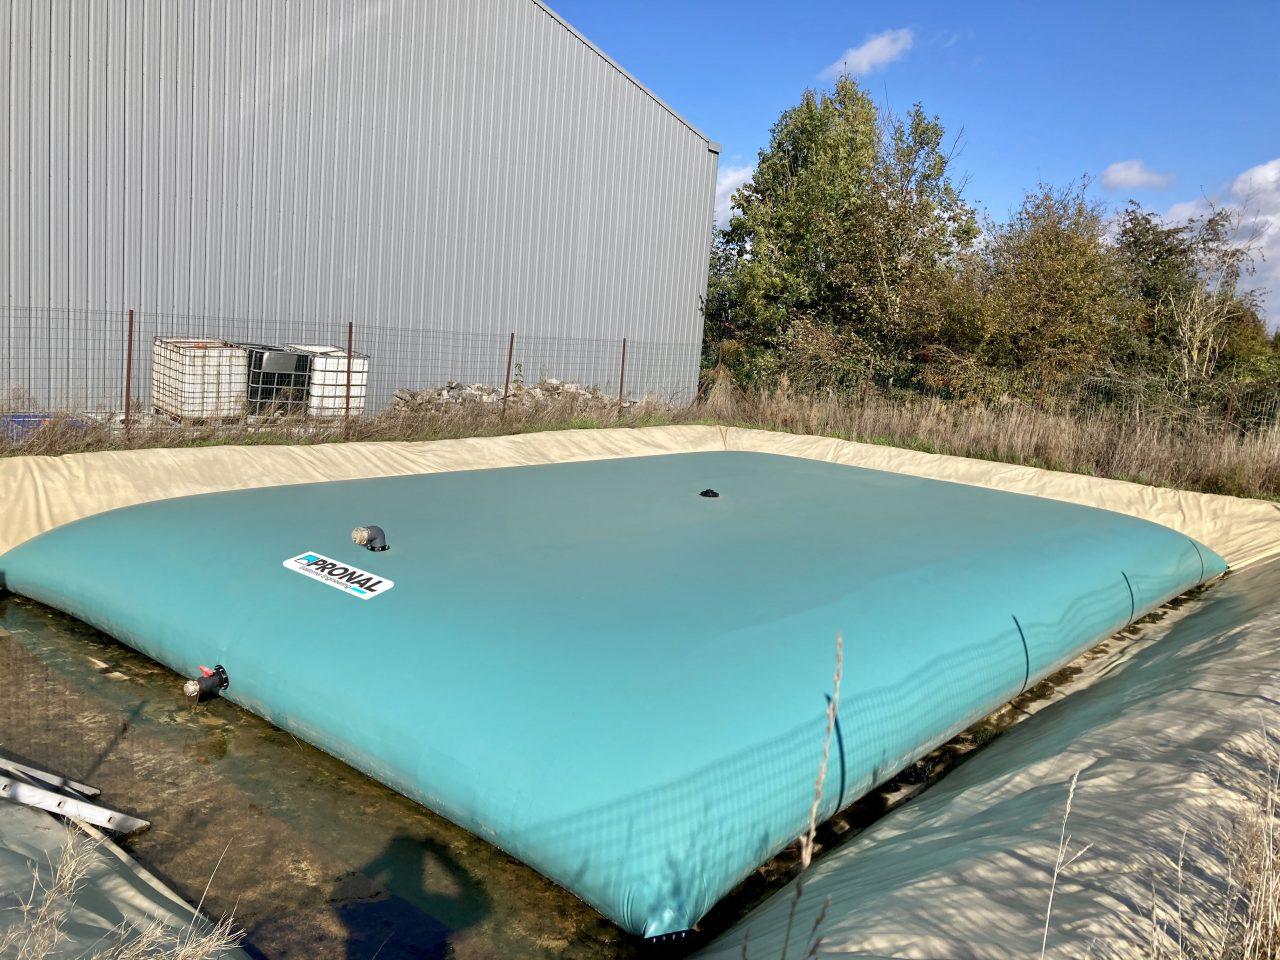 liquid fertilizer tank